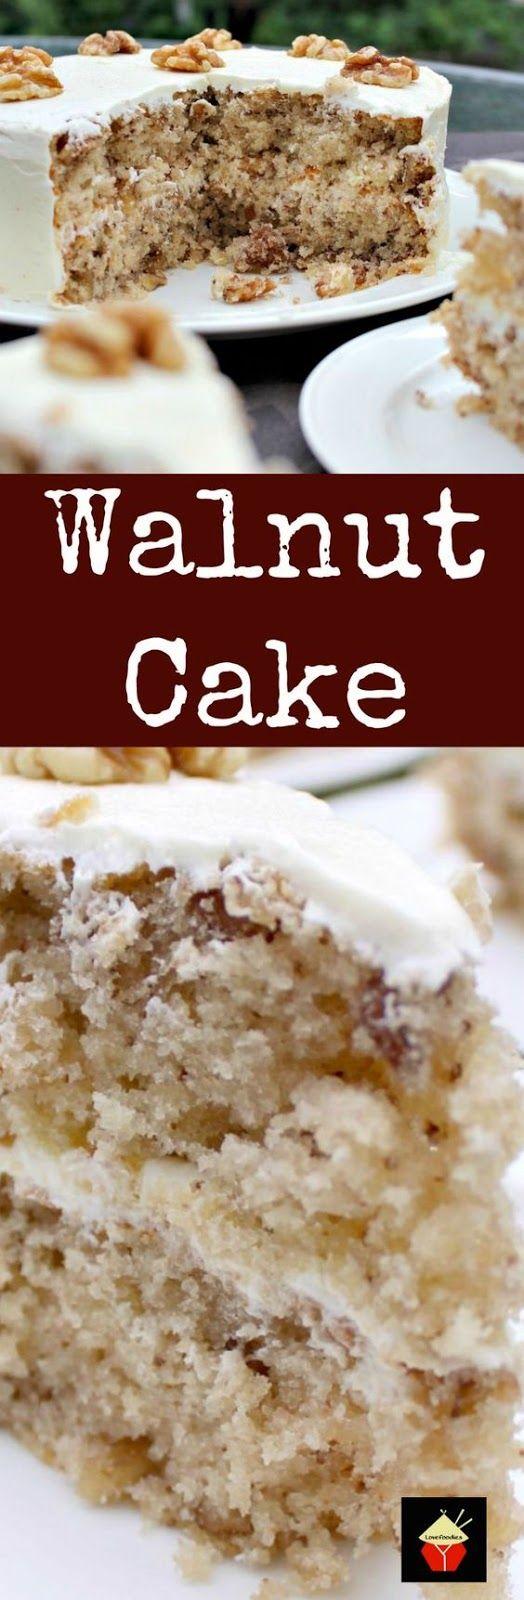 Walnut Cake | Cake And Food Recipe